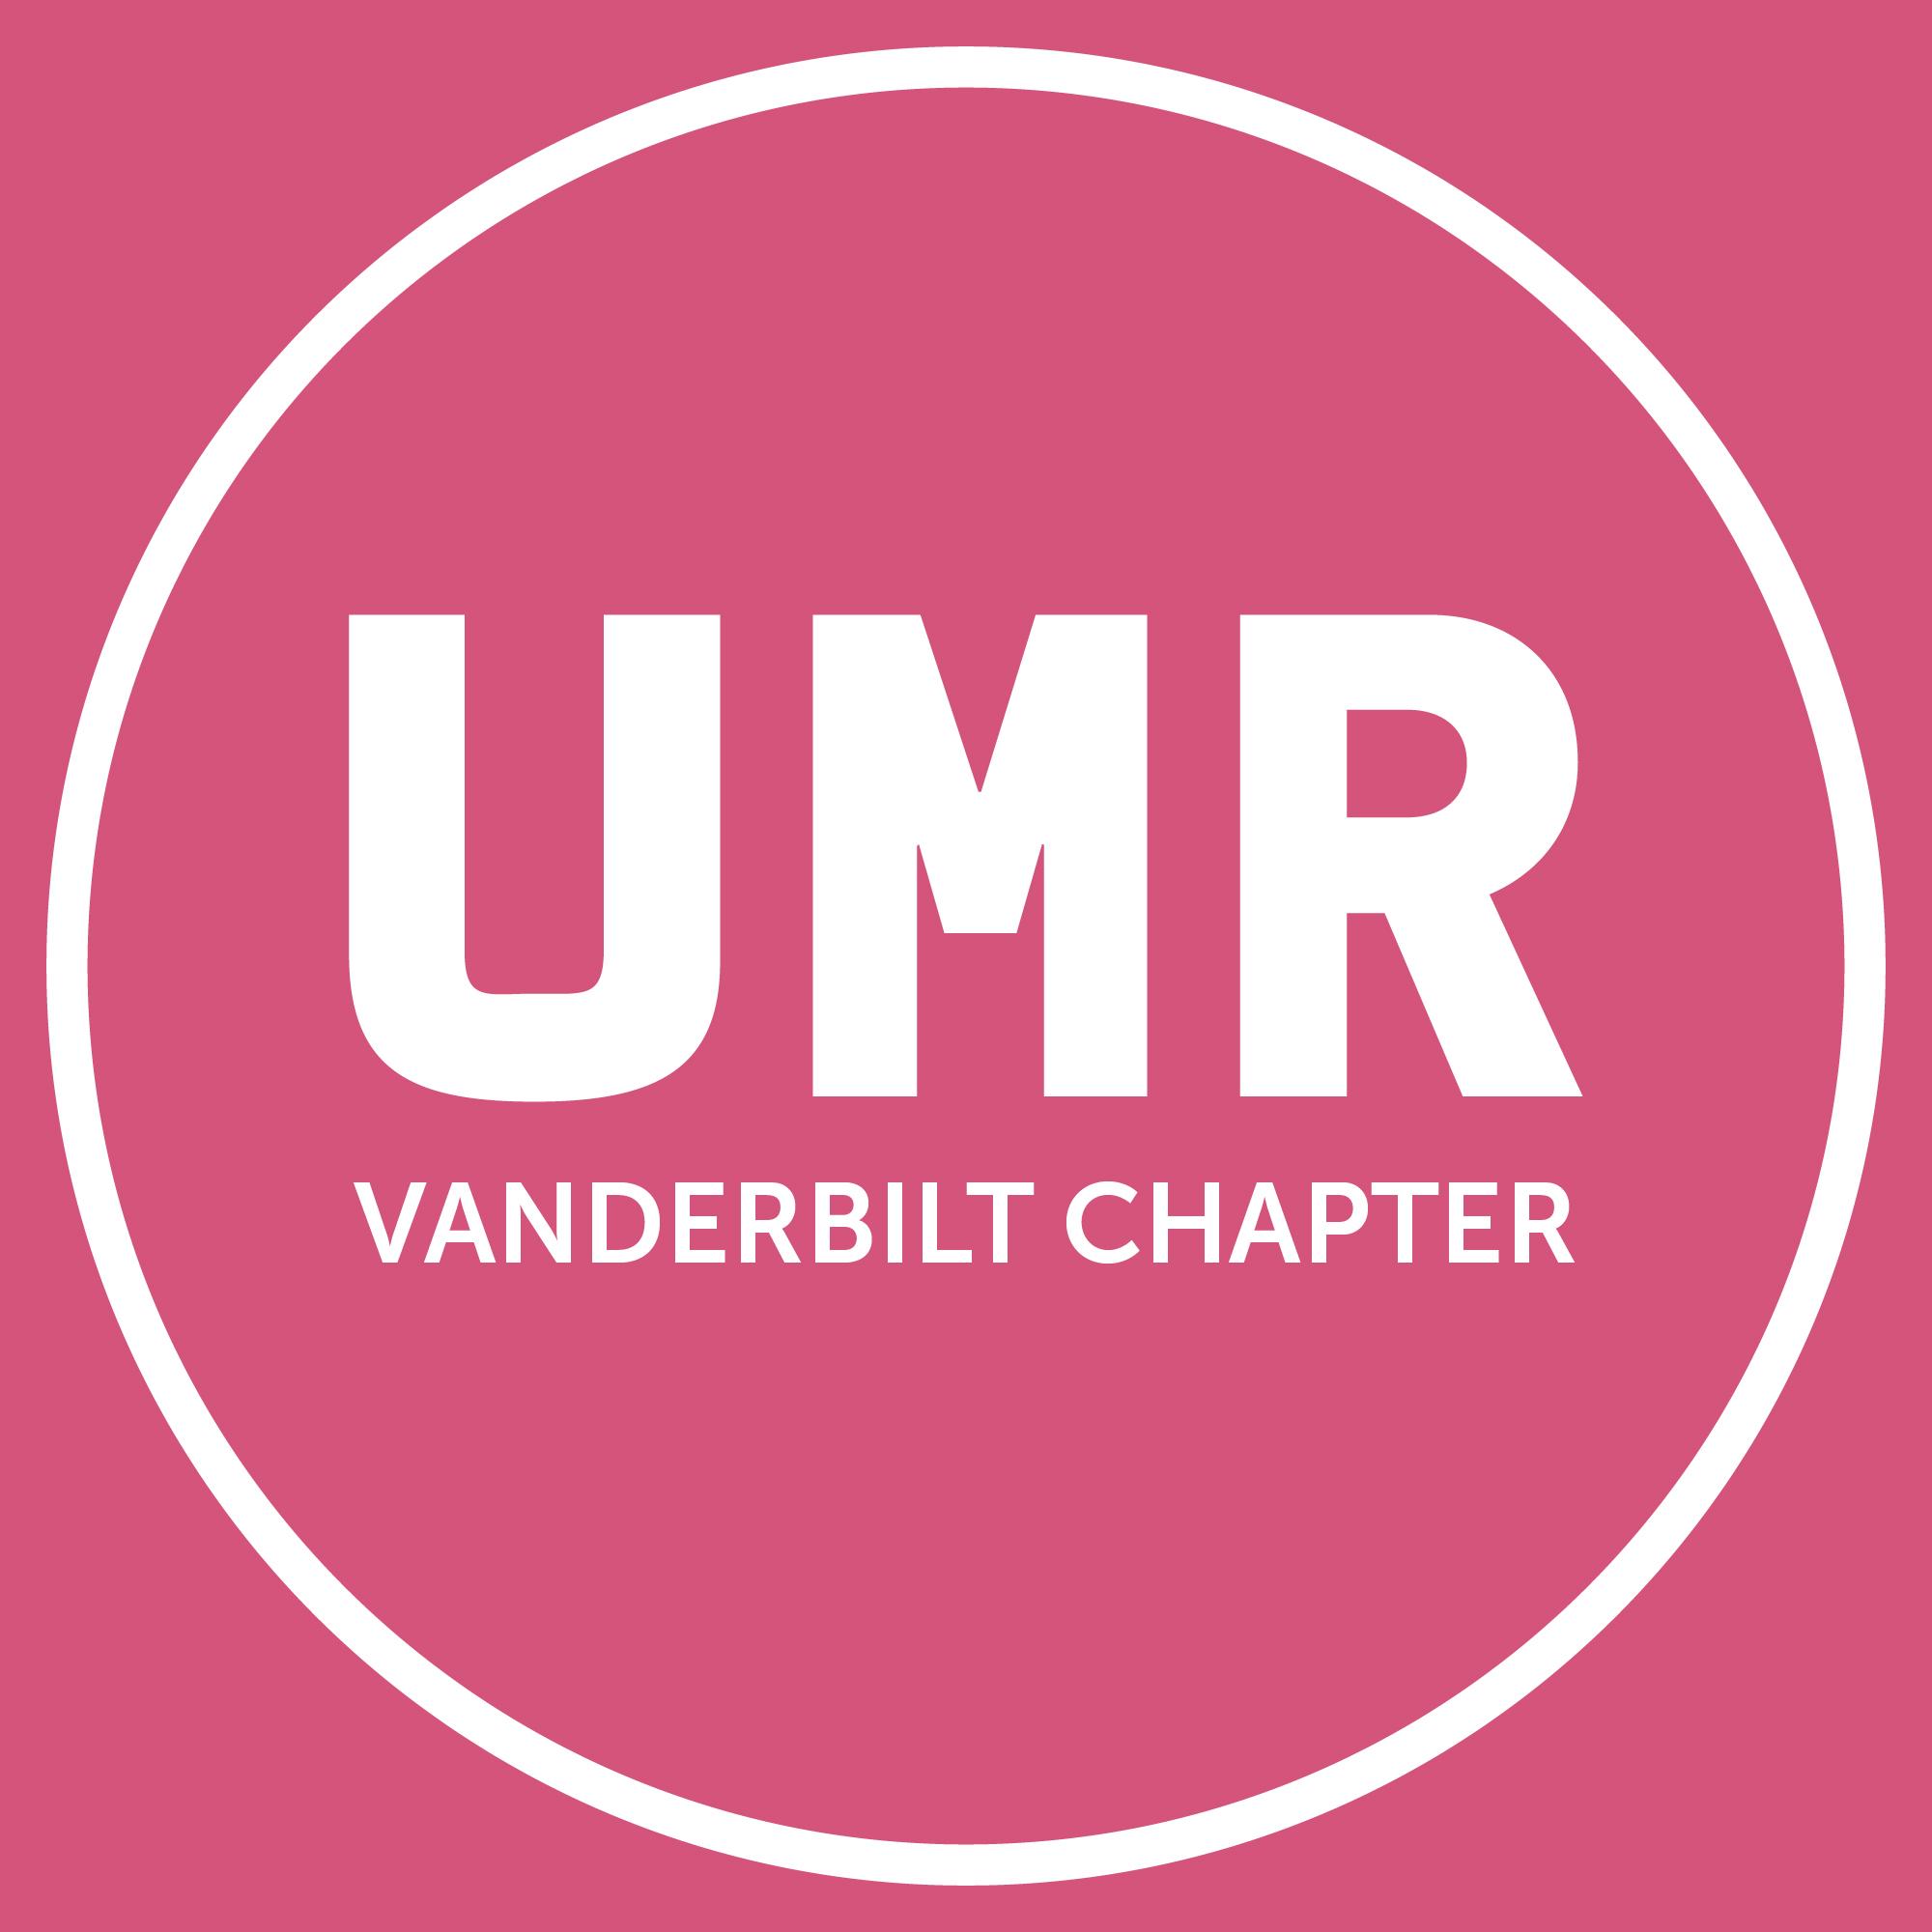 UMR Vanderbilt University Chapter